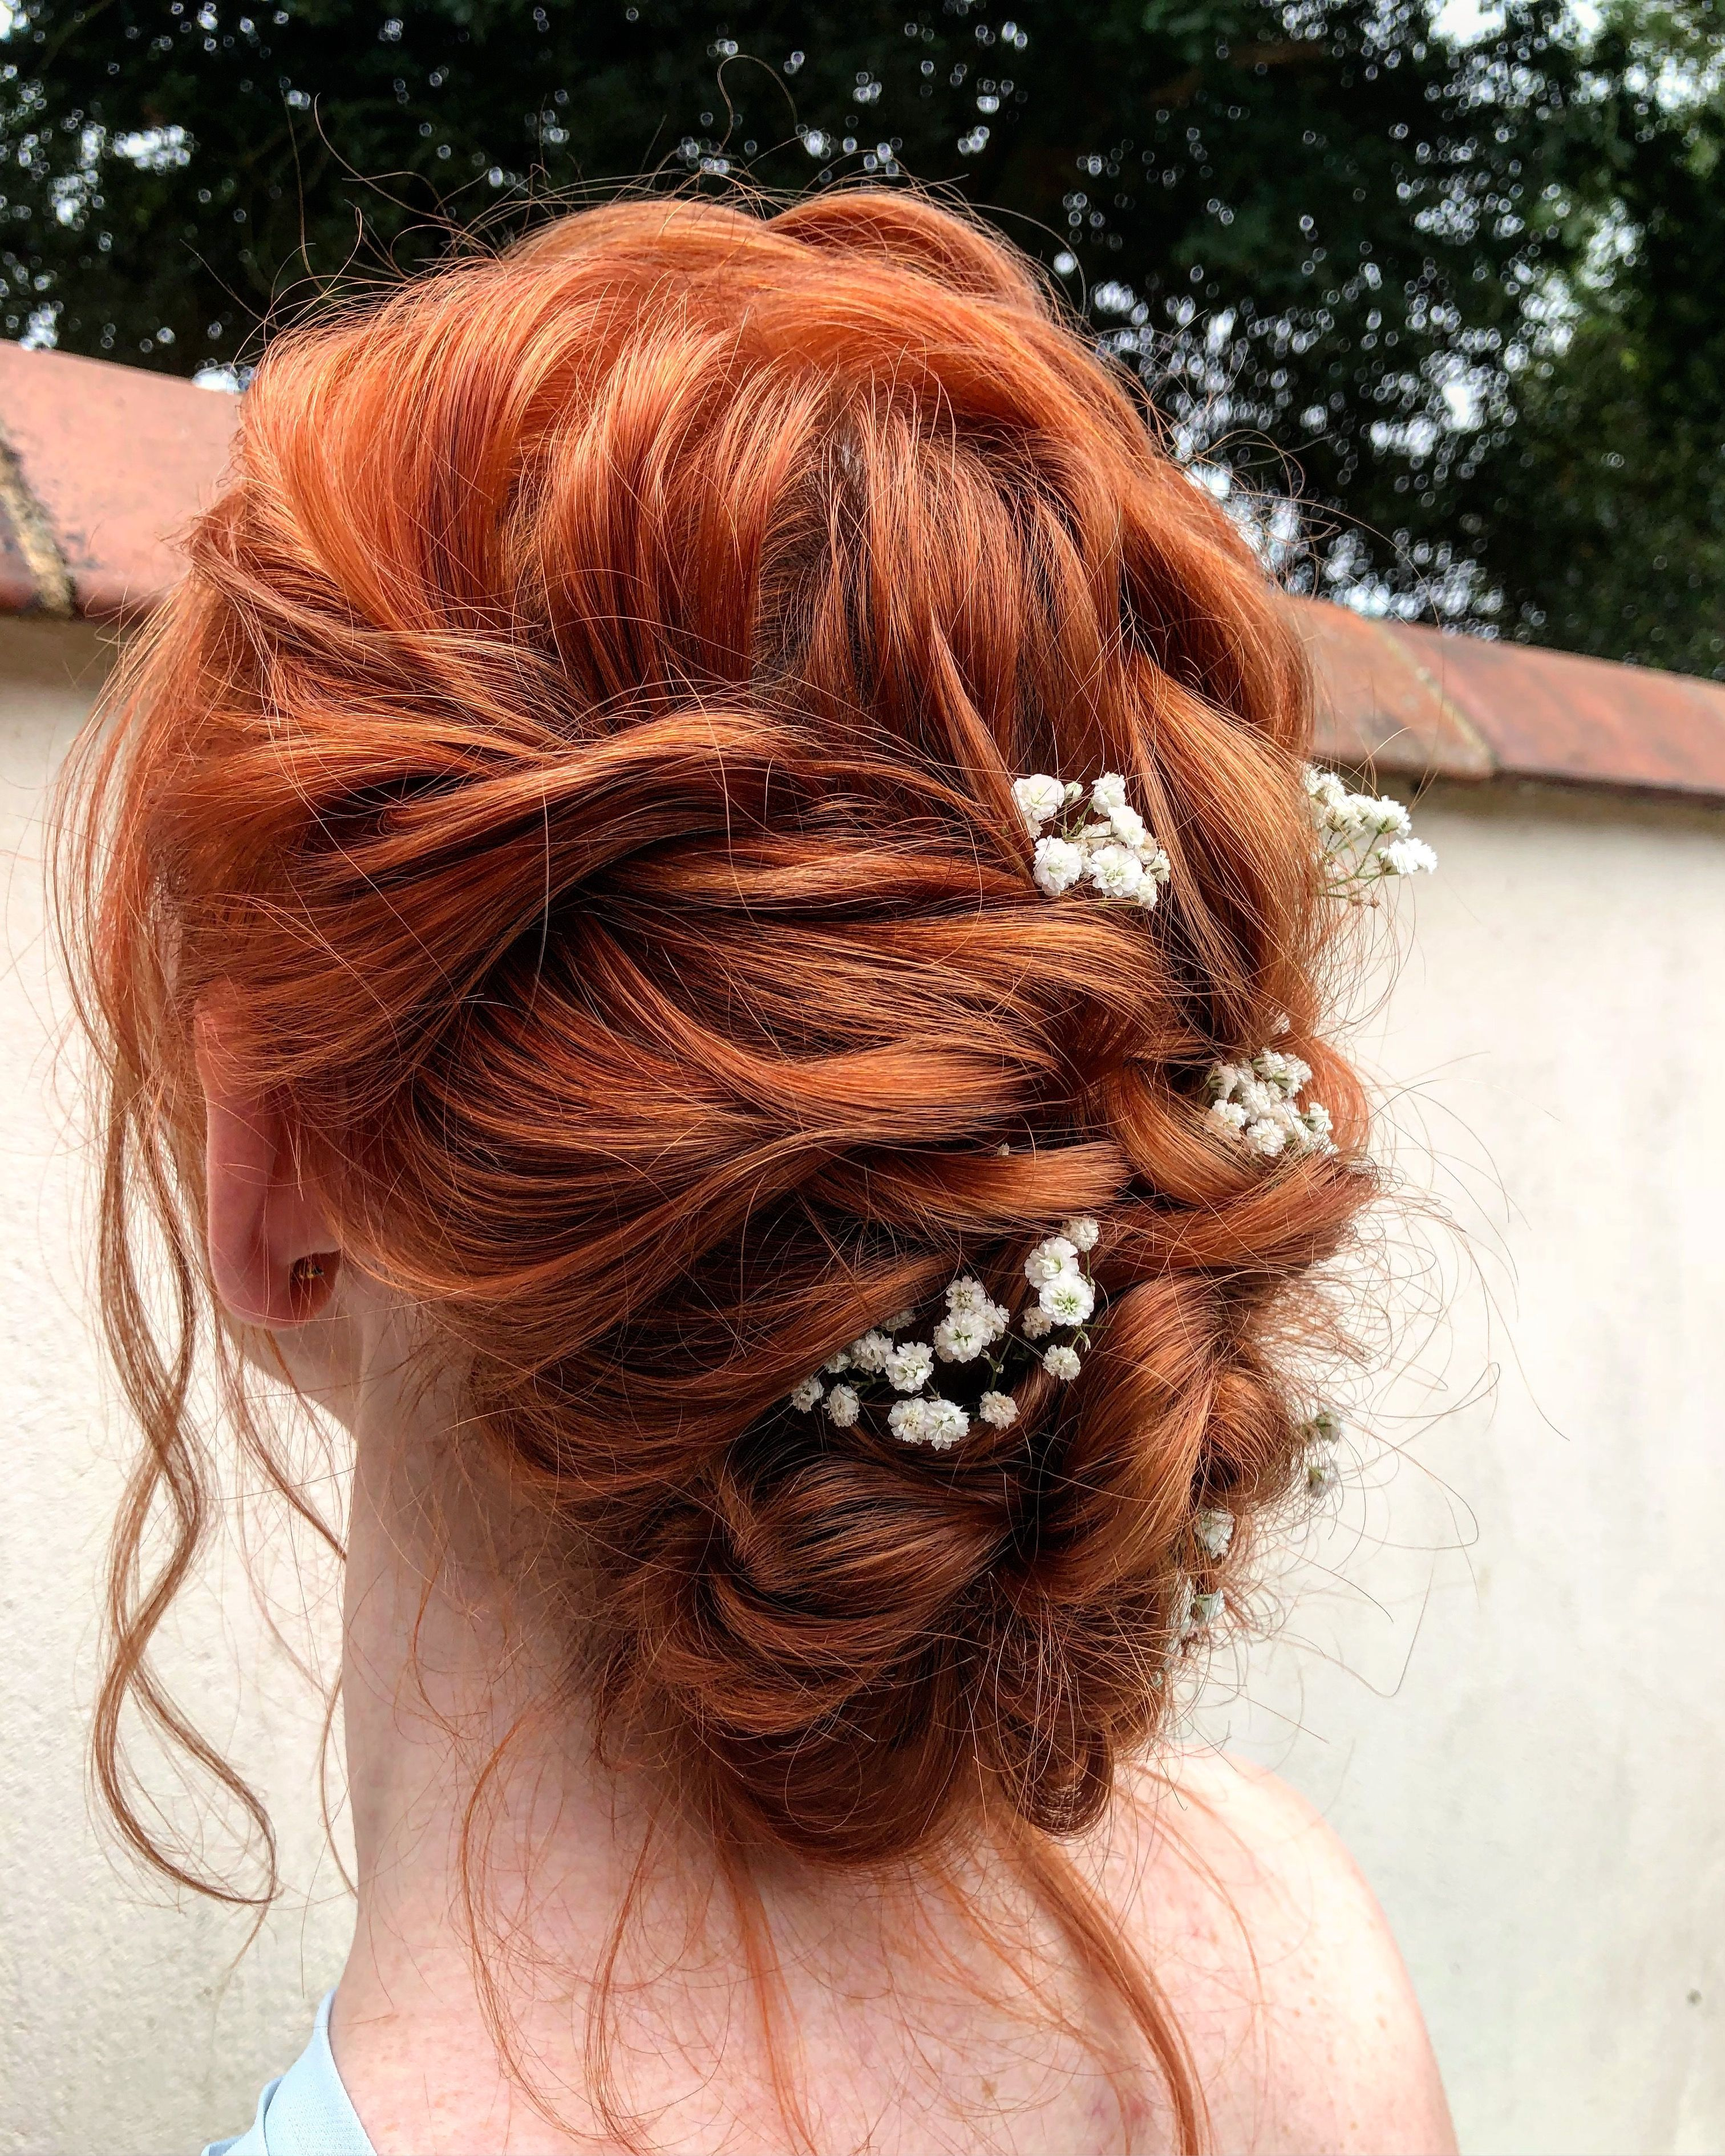 Shorthairstyles Schoolhairstyles In 2020 Hair Styles Redhead Hairstyles Red Hair Updo